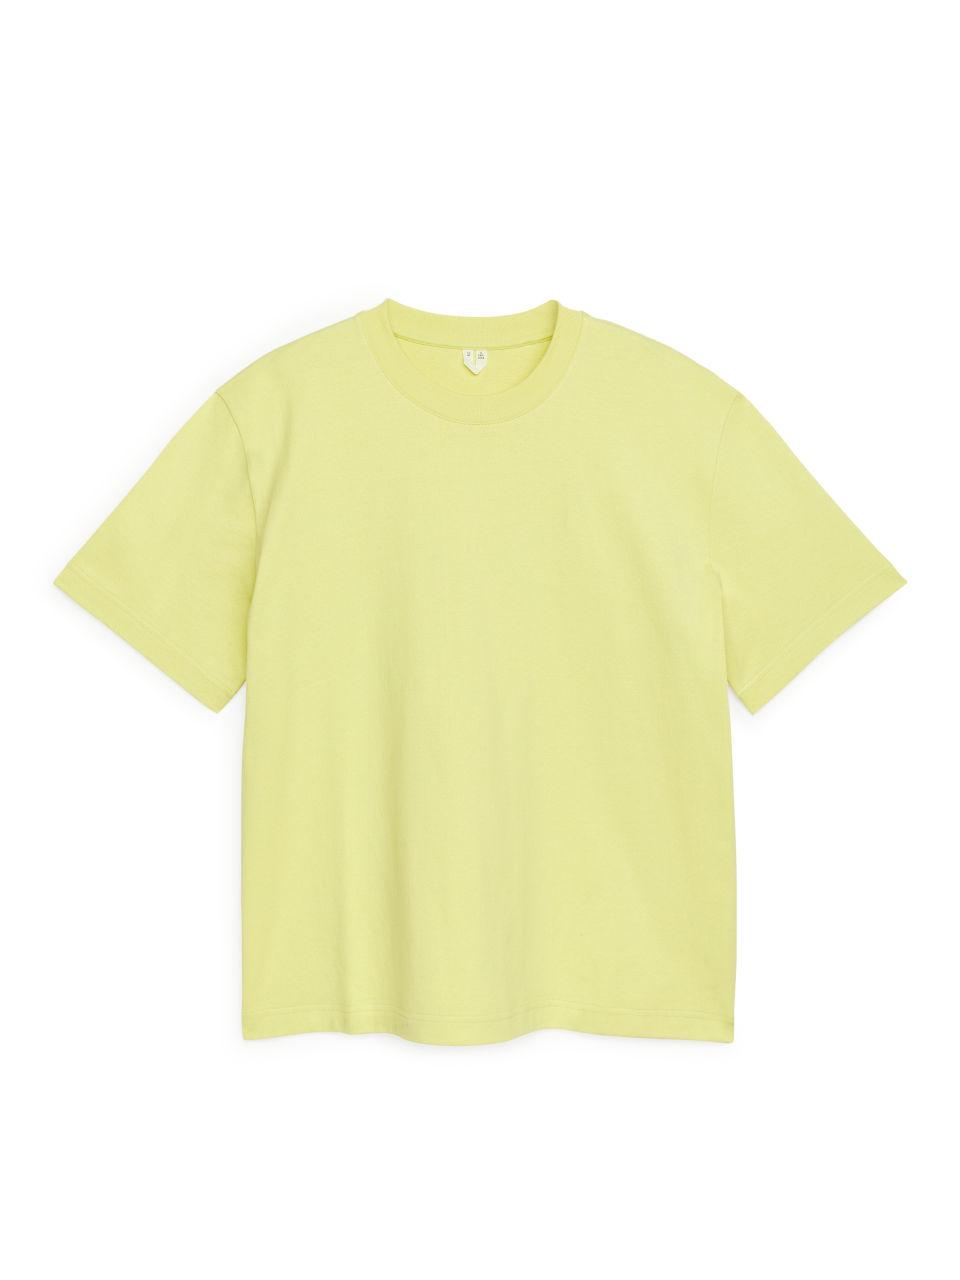 Oversized Heavyweight T-shirt - Yellow